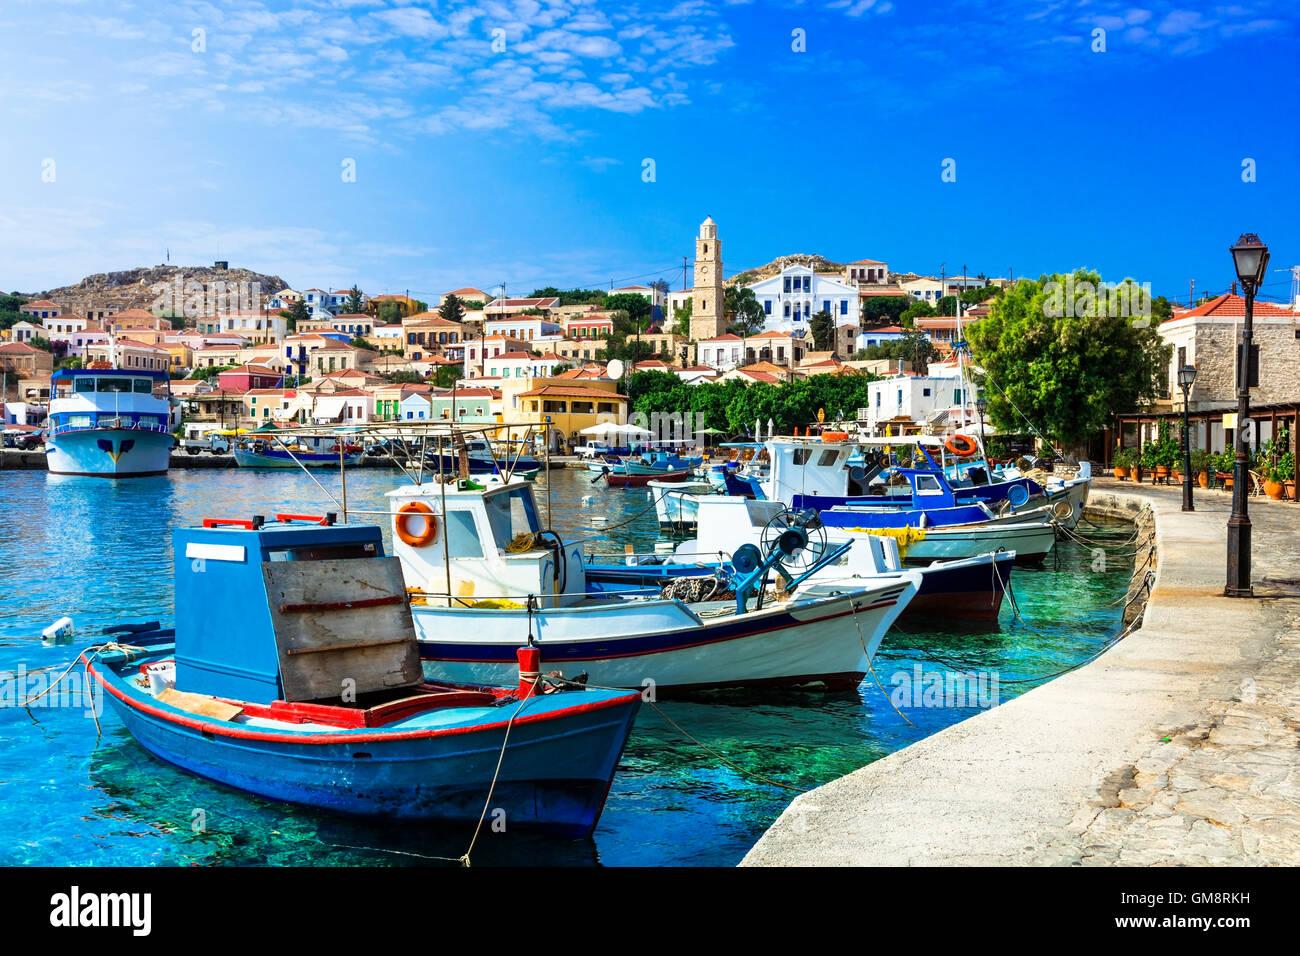 traditional Greece- Chalki island with ishing boats, Dodecanese - Stock Image